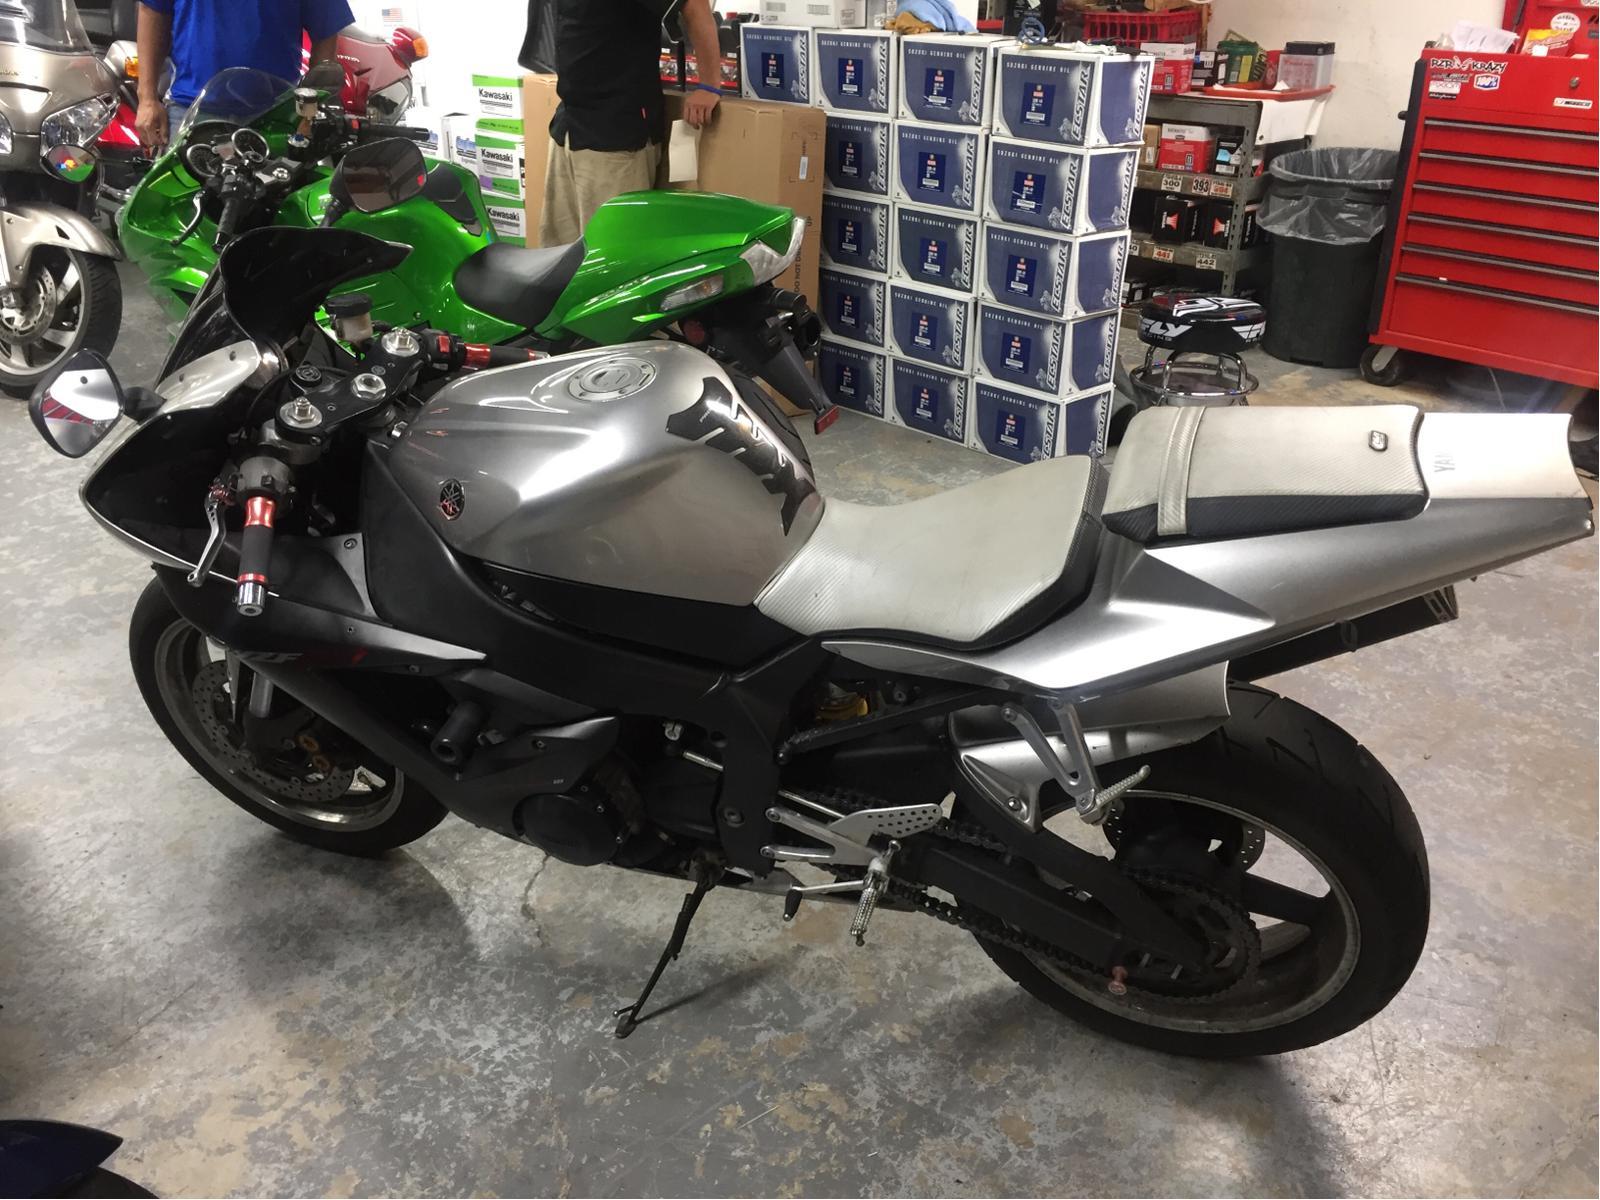 2003 Yamaha YZF-R1 3